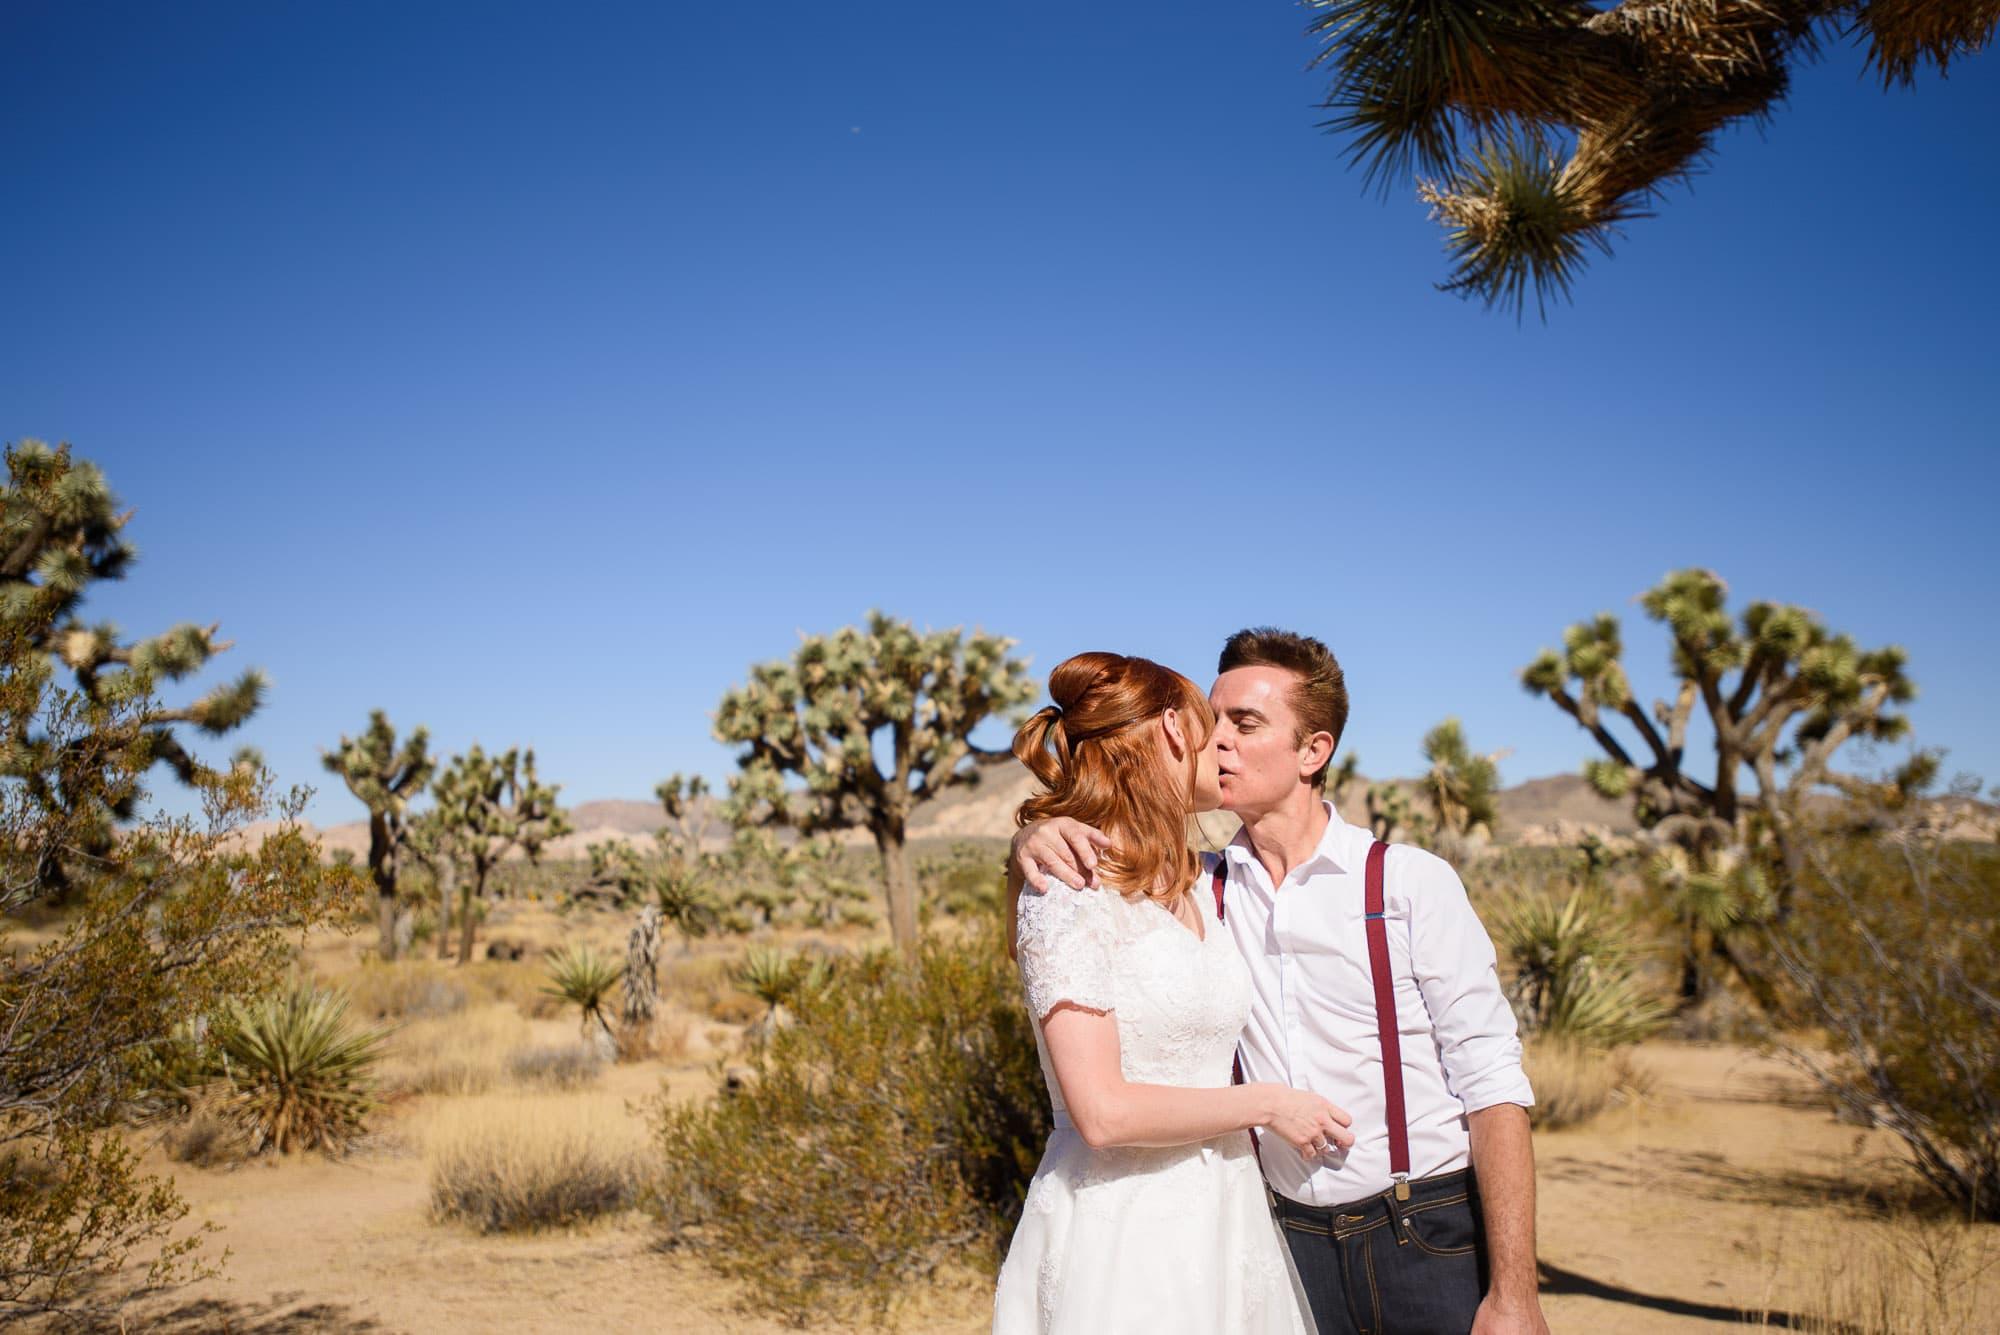 020_Alan_and_Heidi_Joshua_Tree_Destination_Wedding